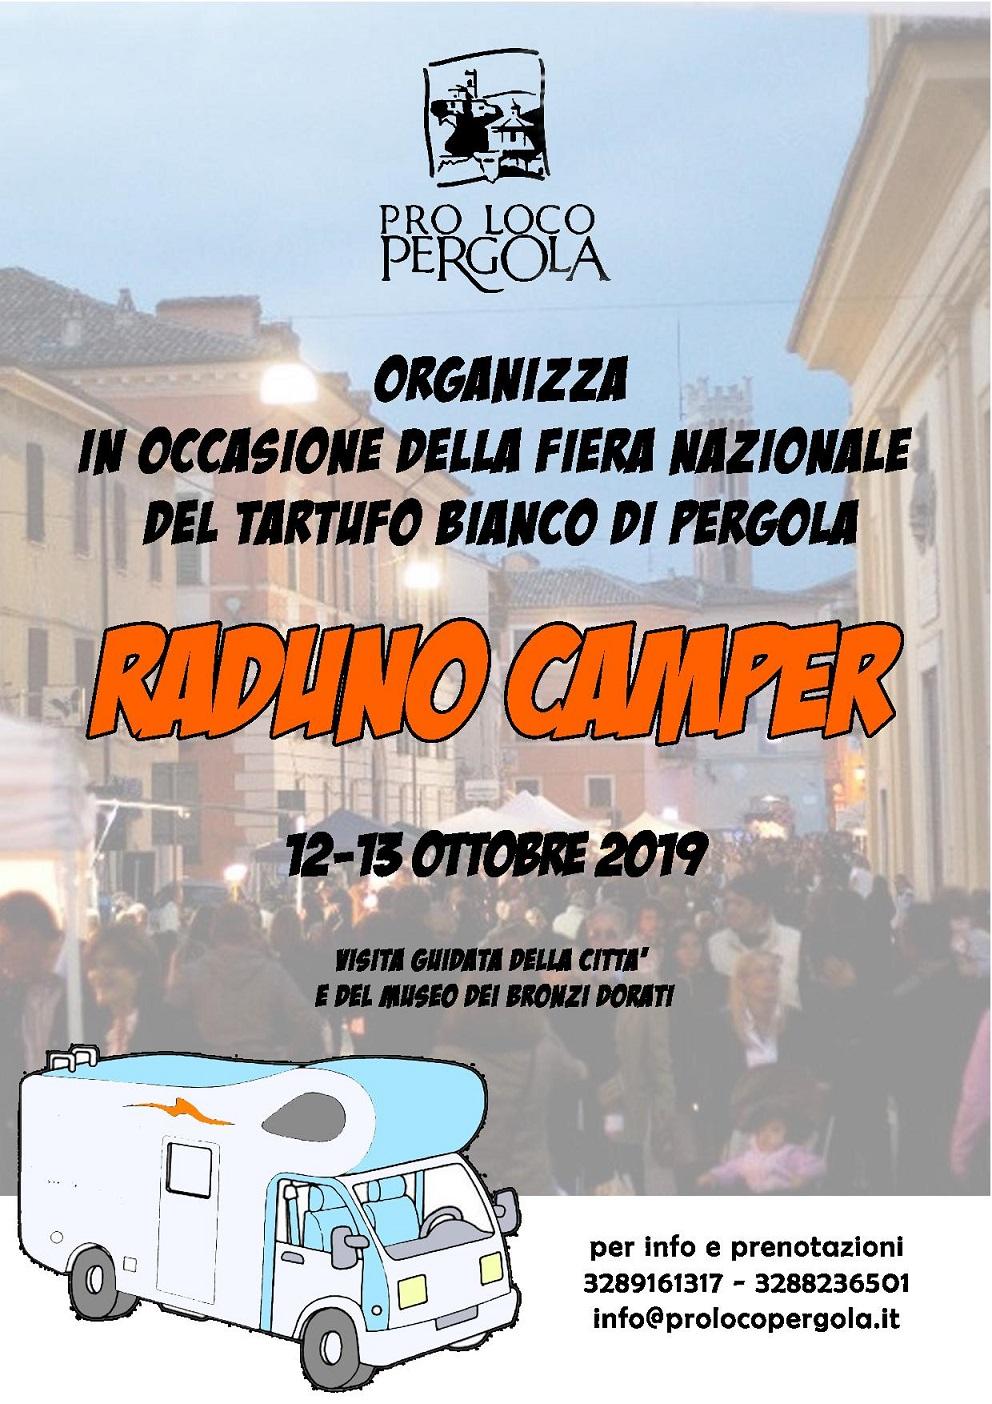 raduno camper fiera tartufo pergola 2019